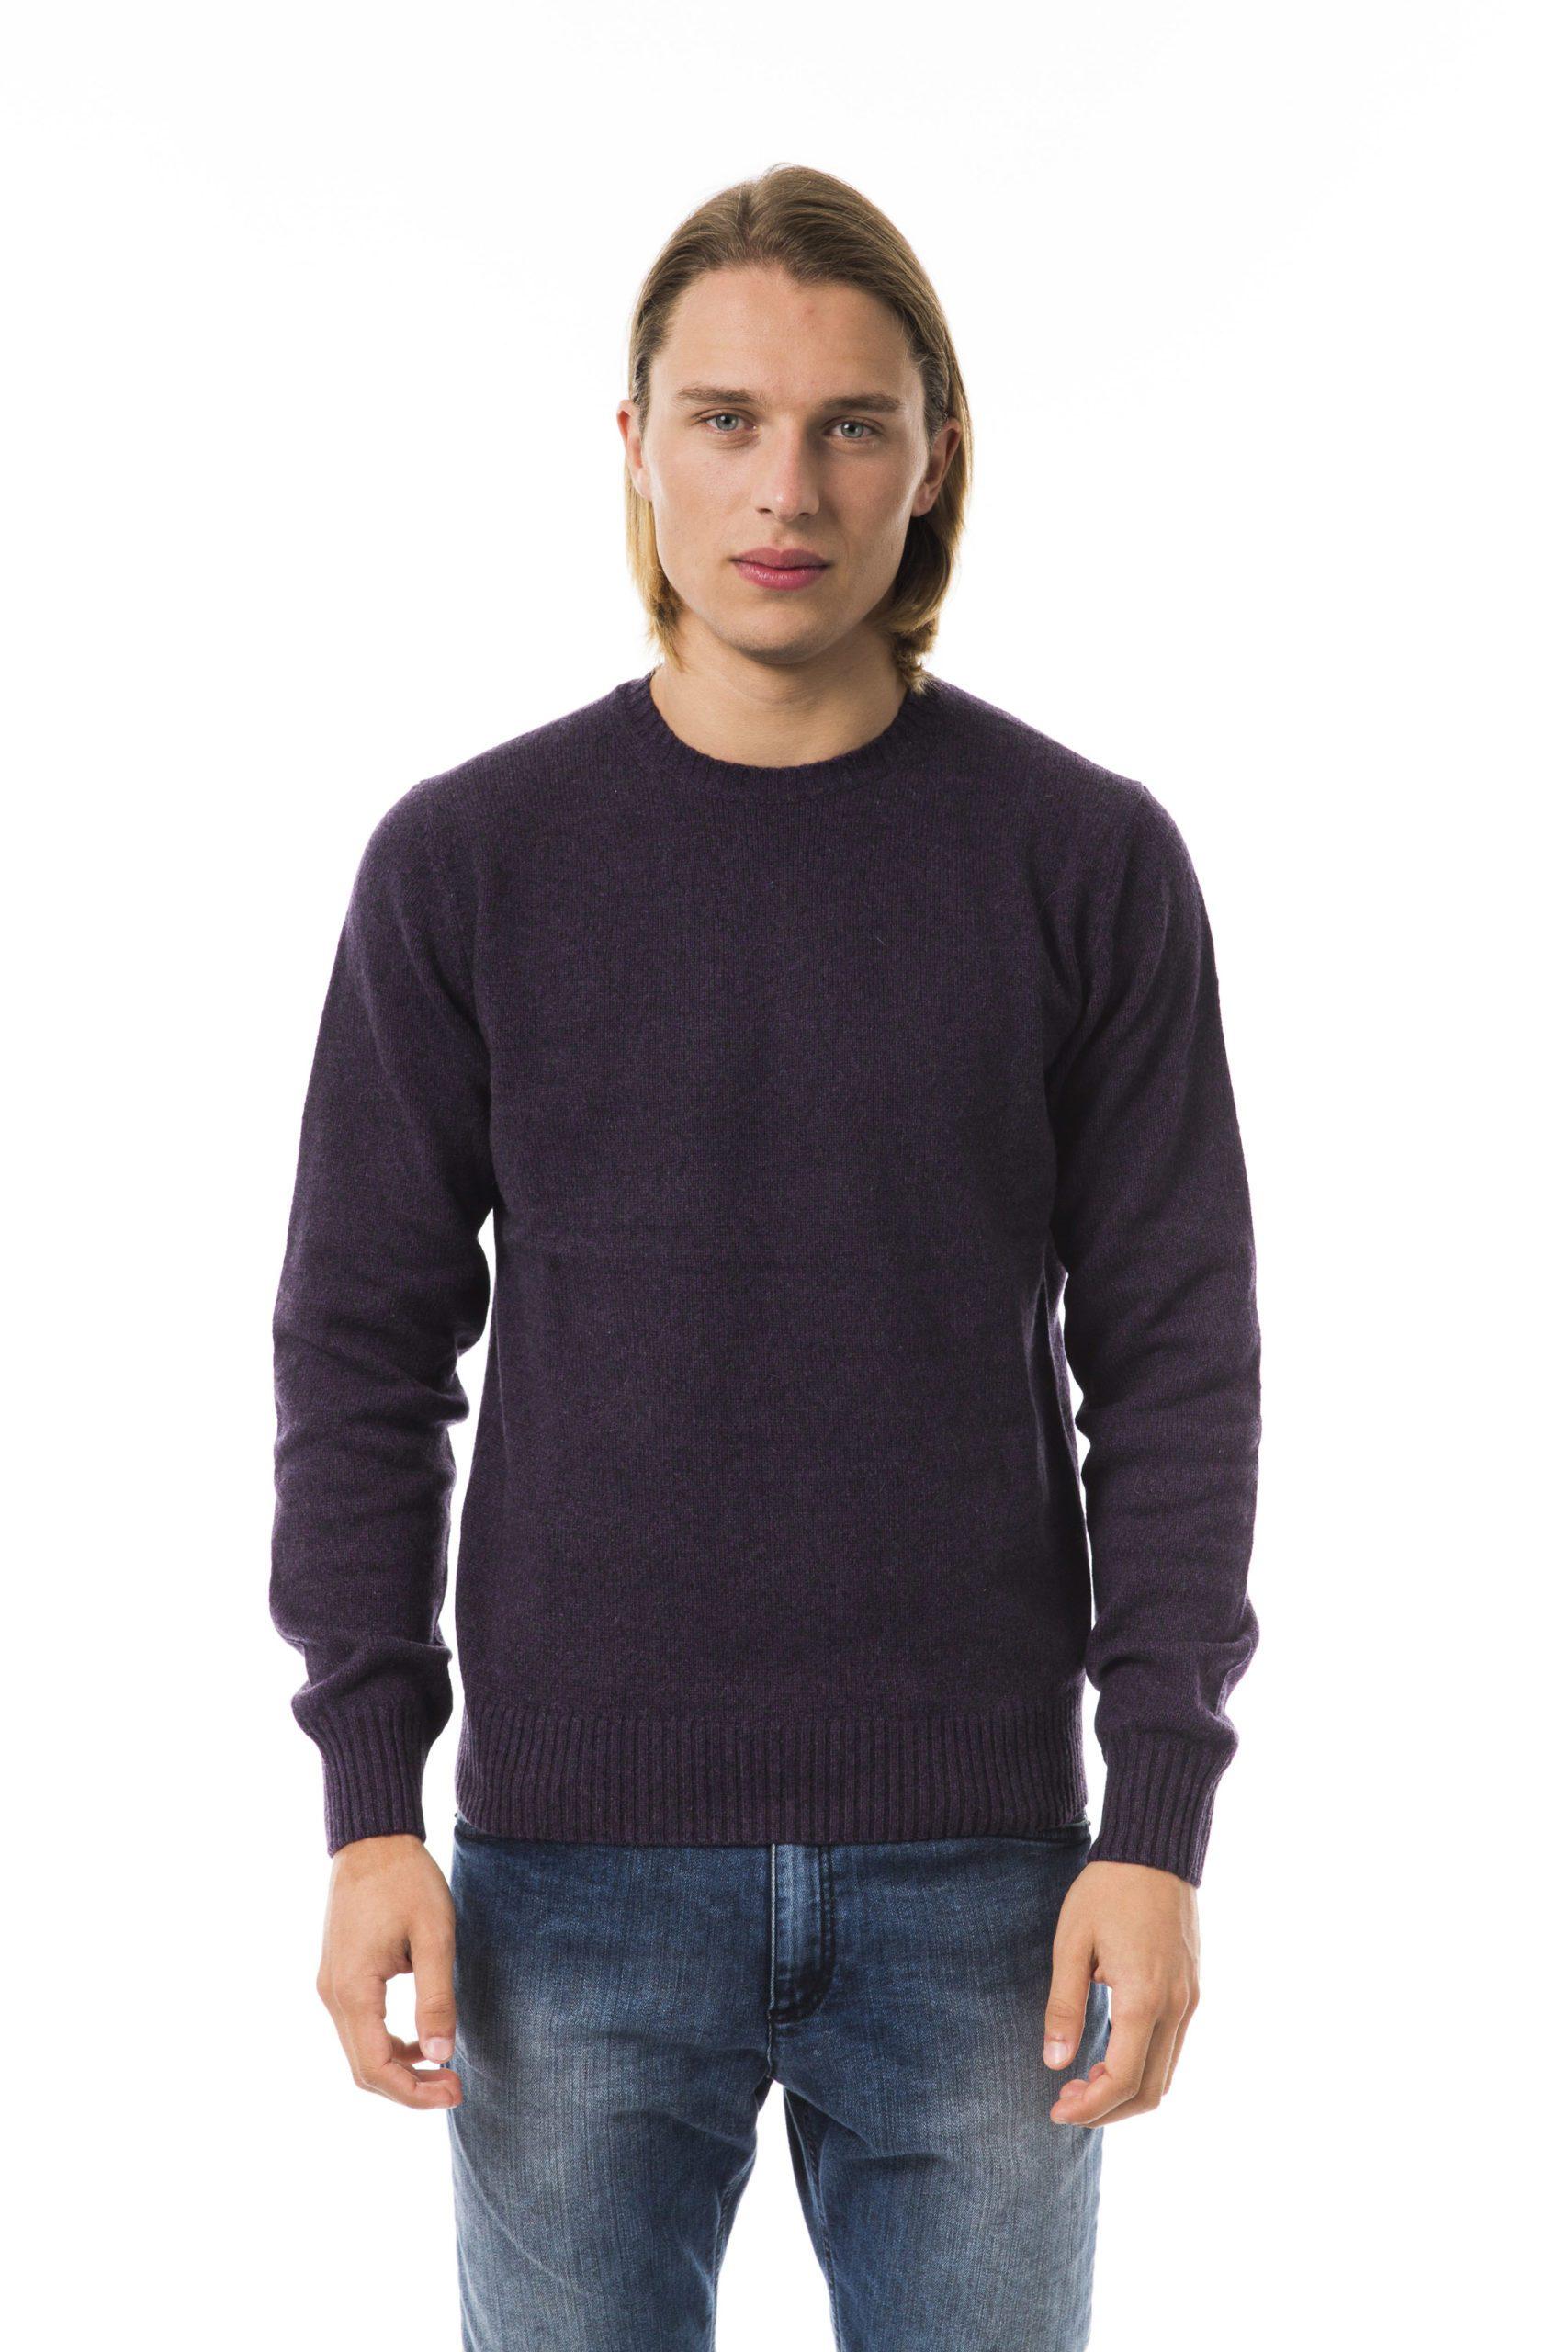 Uominitaliani Men's Sweater Viola Sweater Violet UO816428 - L